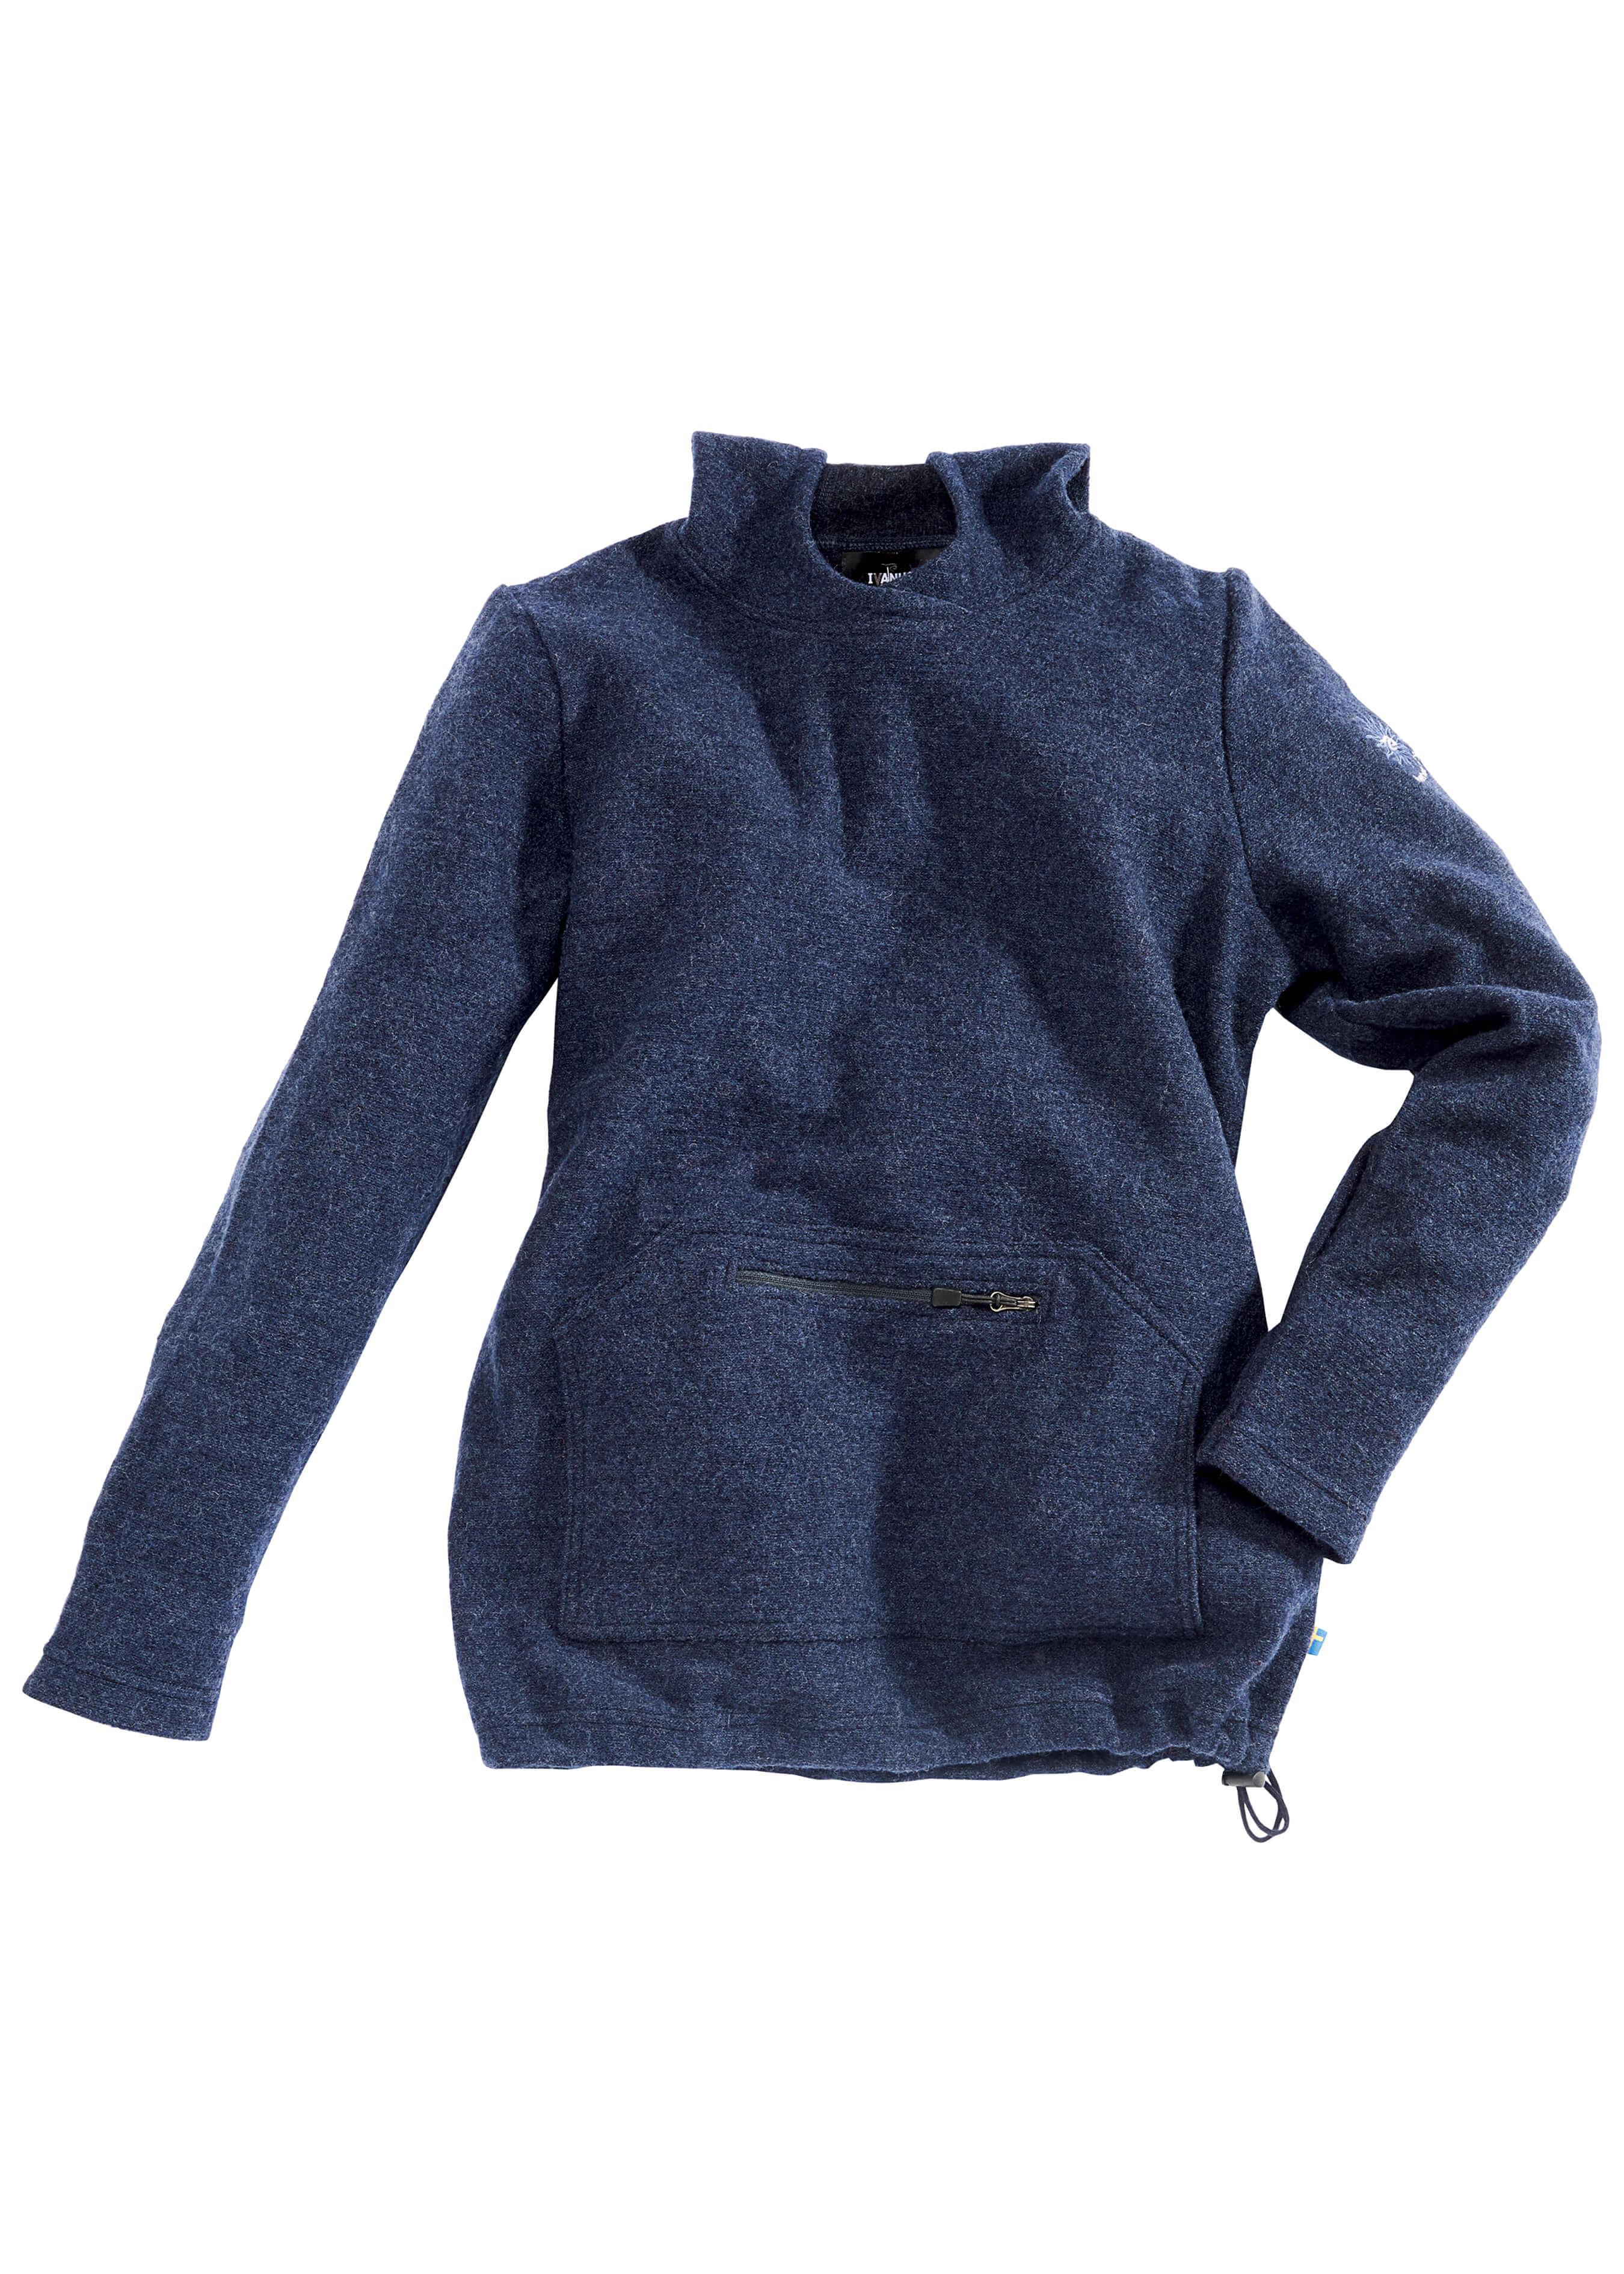 Ivanhoe Damen Merino Kapuzen-Pullover Bibi 26603236 1